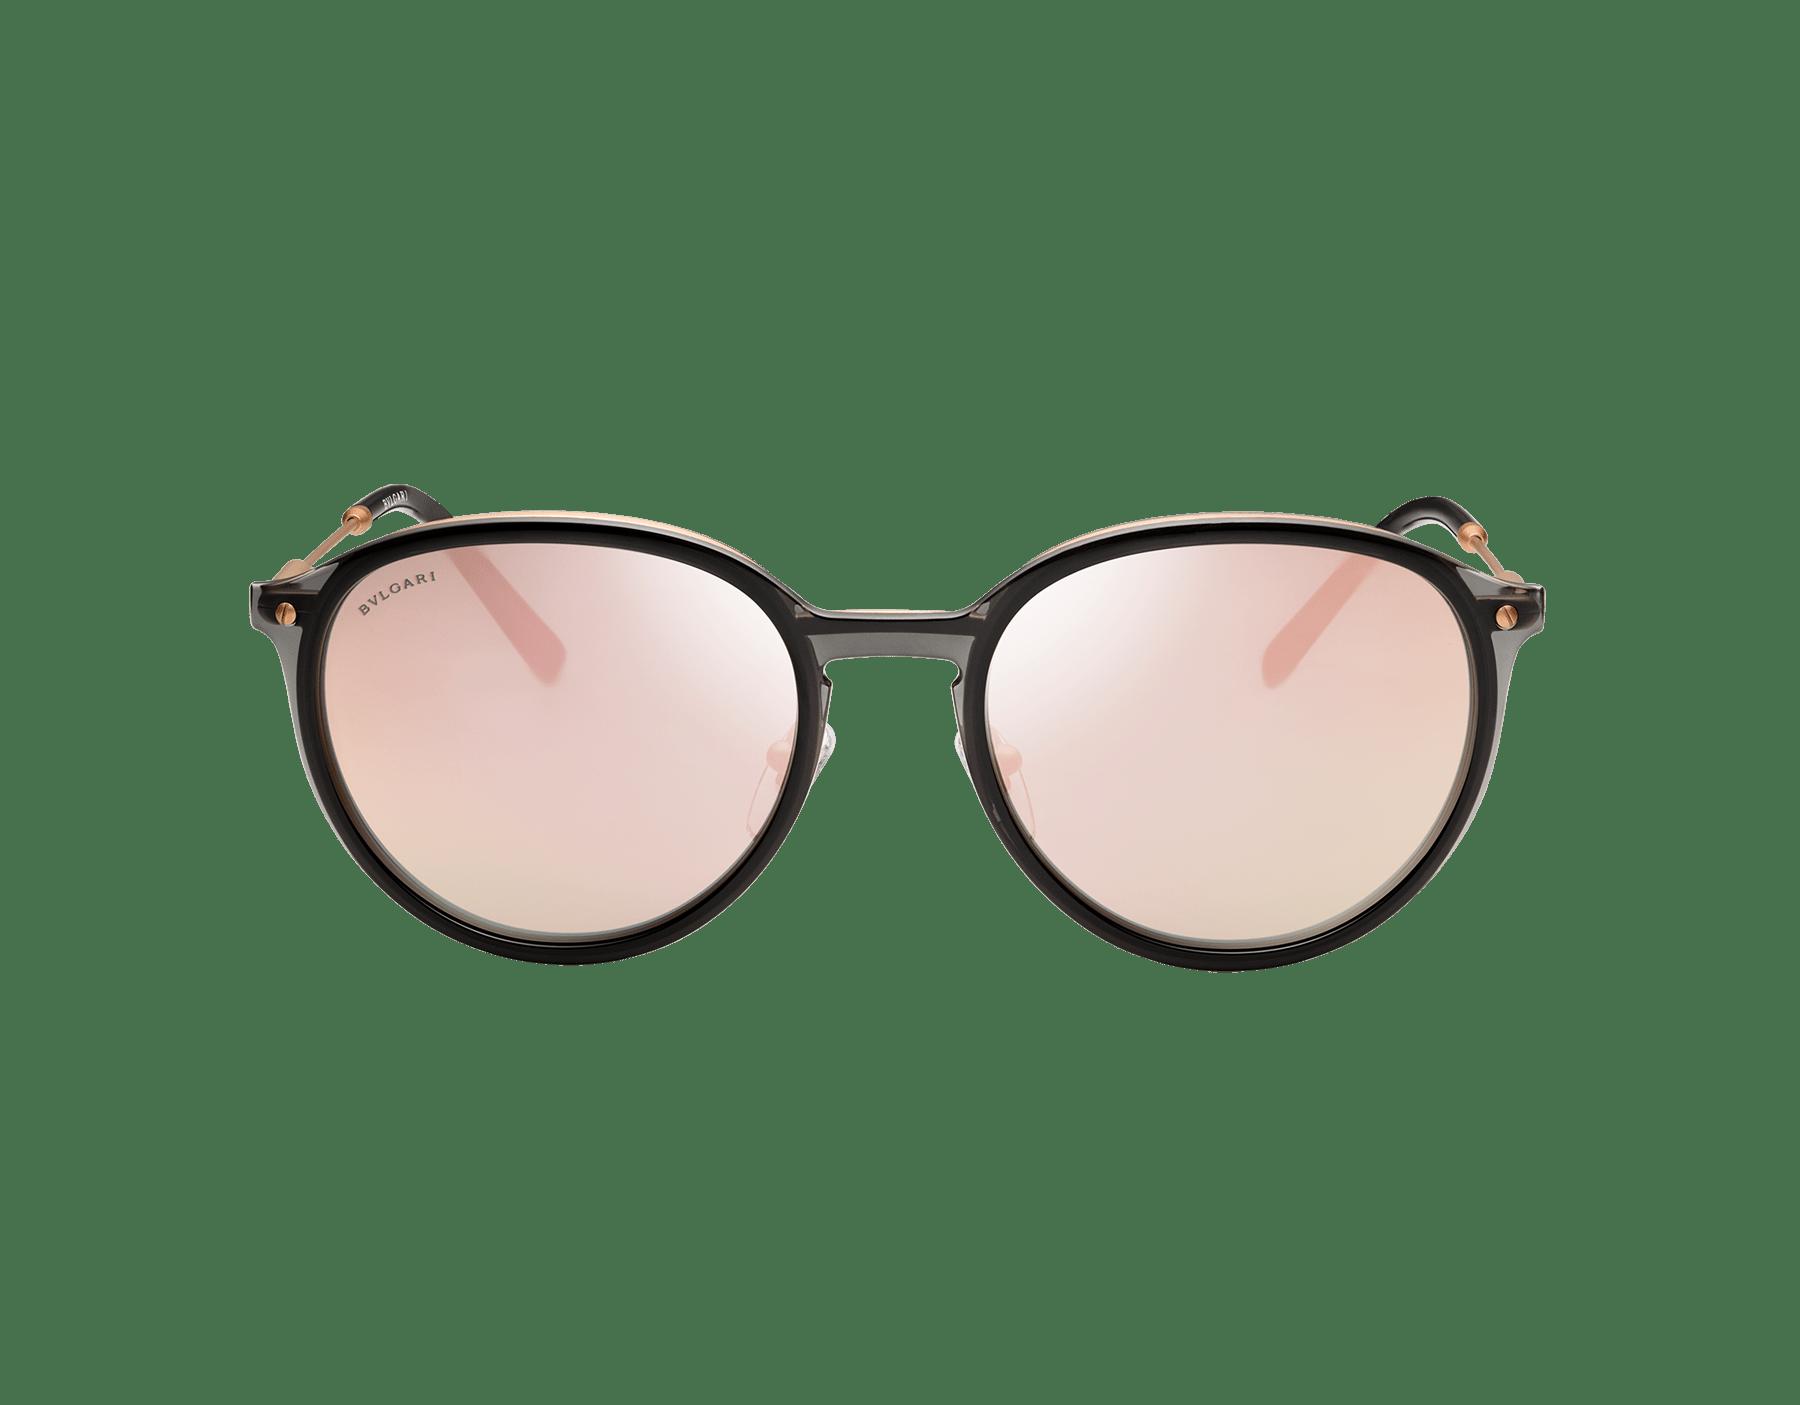 Óculos de sol Diagono com formato redondo em metal. 903556 image 2